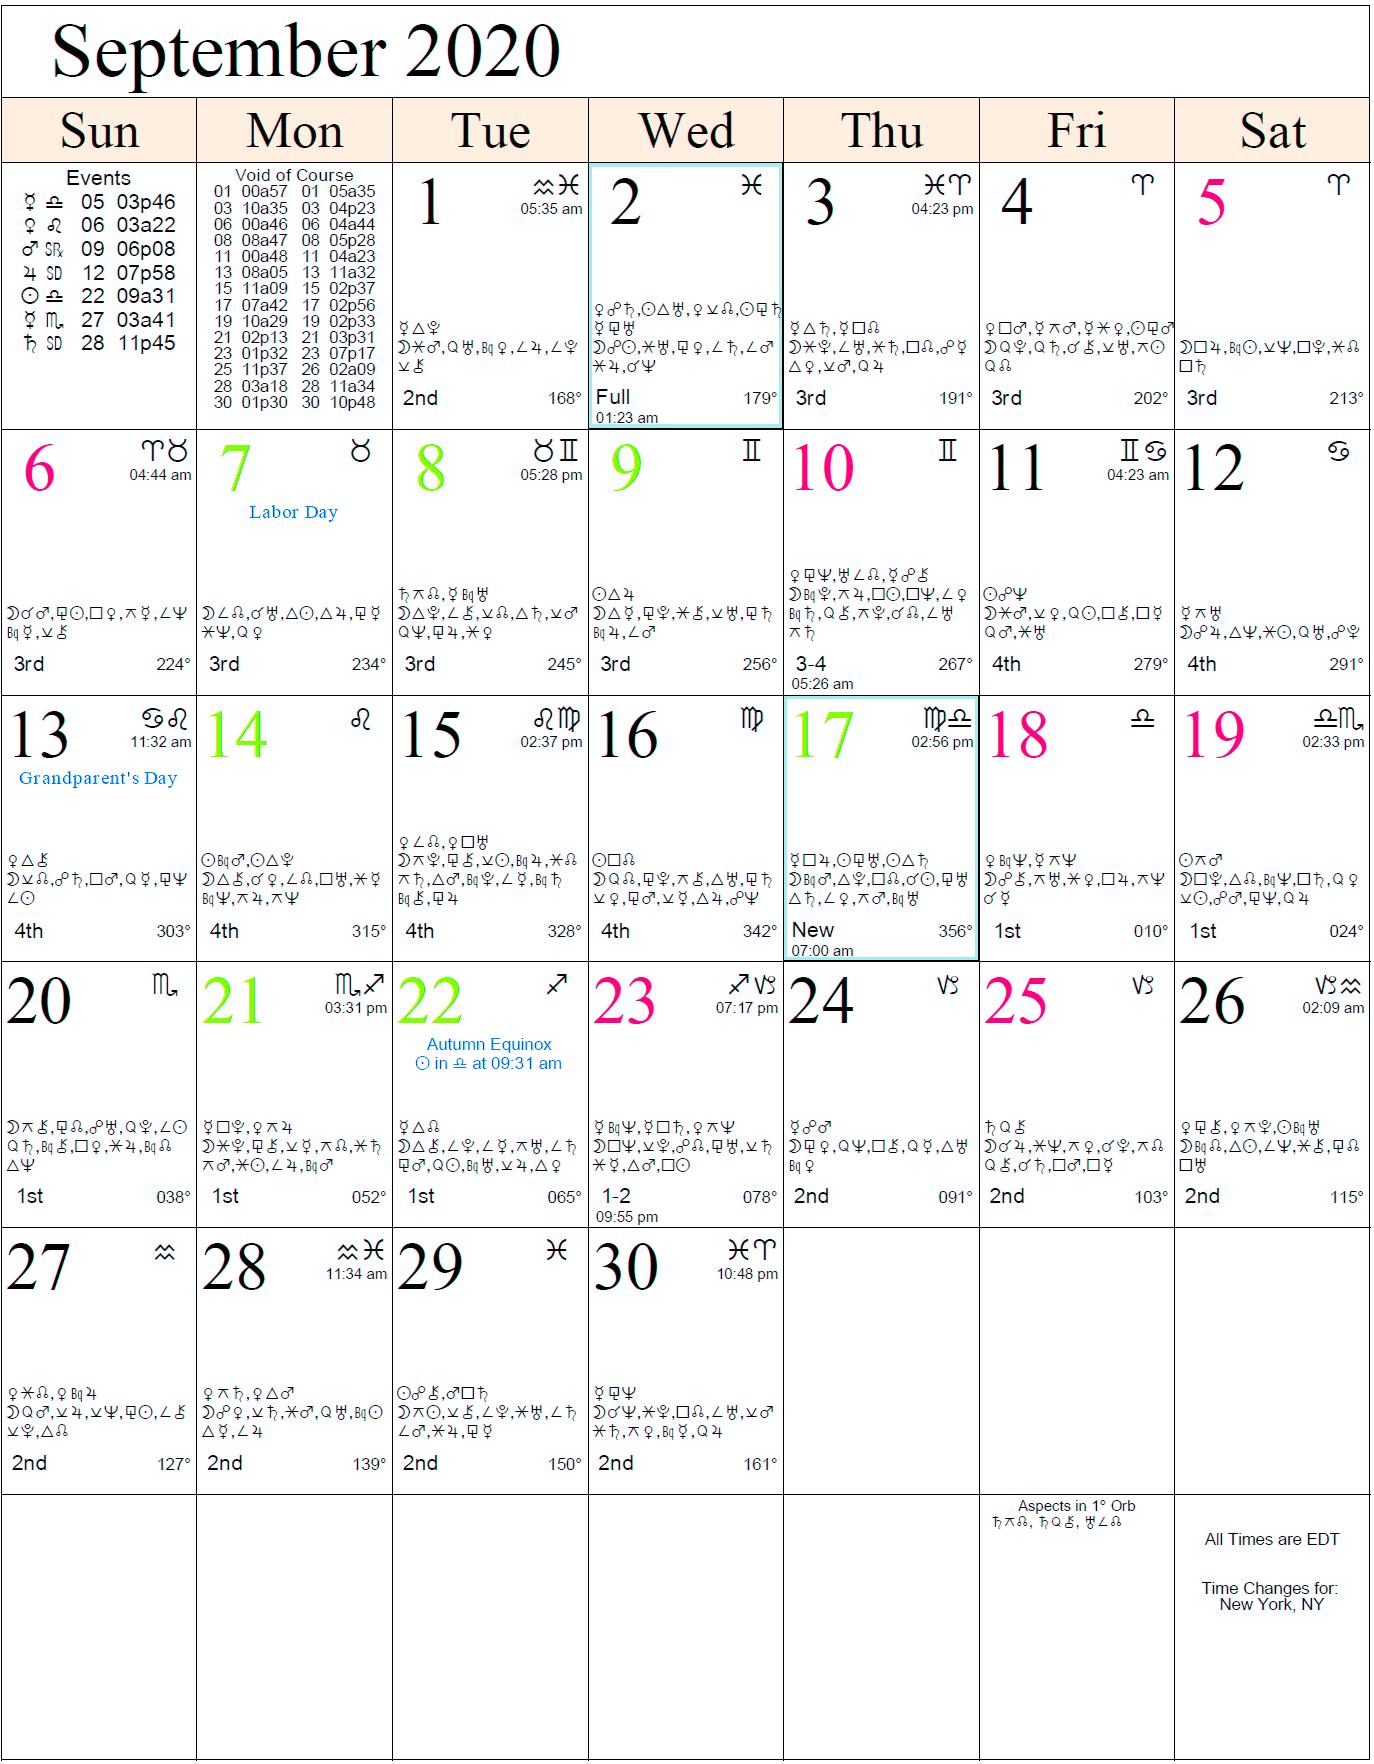 February 2021 Astrology Signs Calendar   Calendar 2021